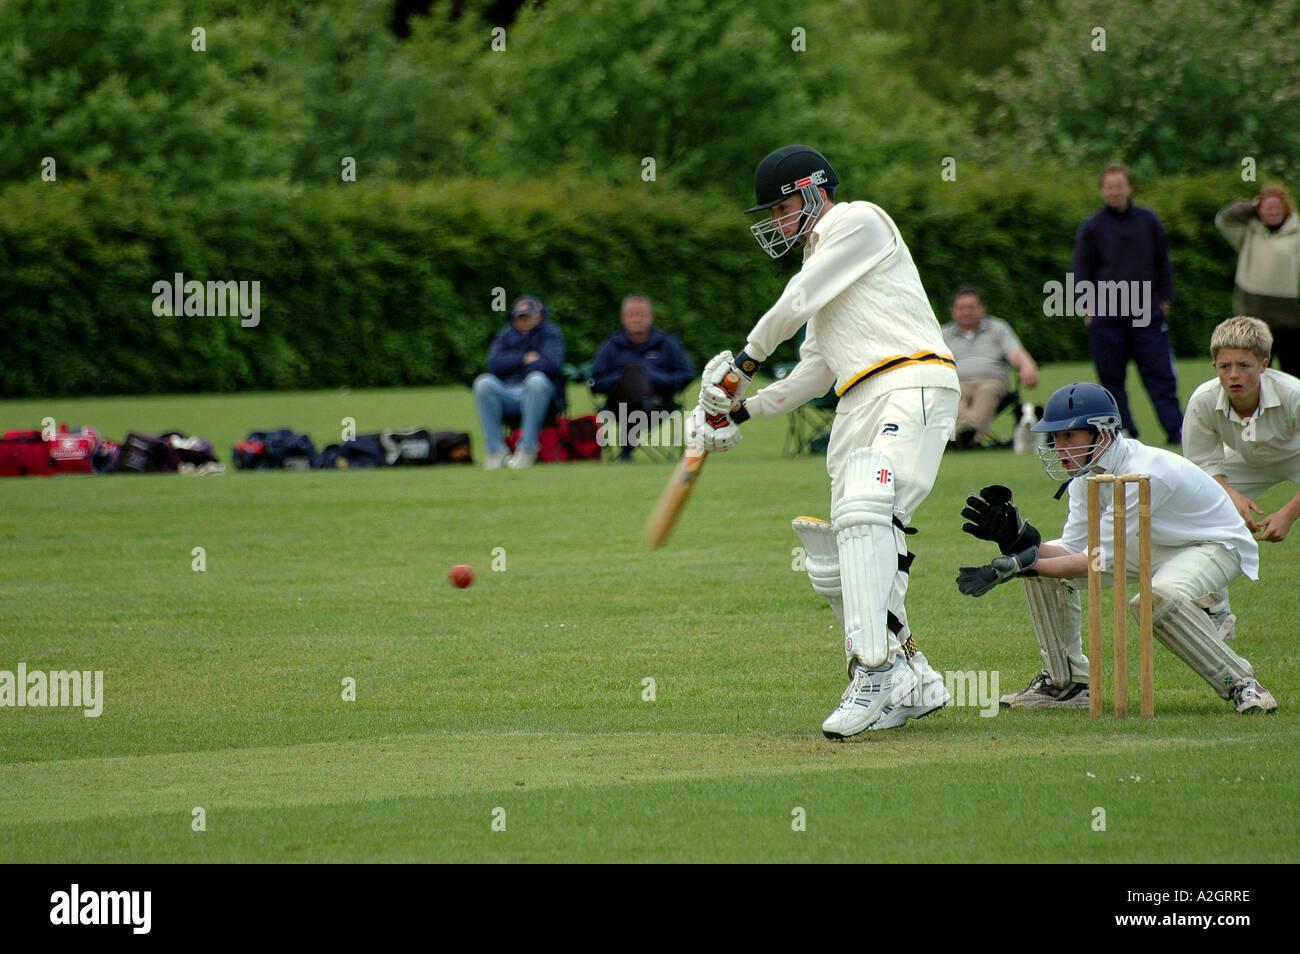 School Boys Cricket Match - Stock Image